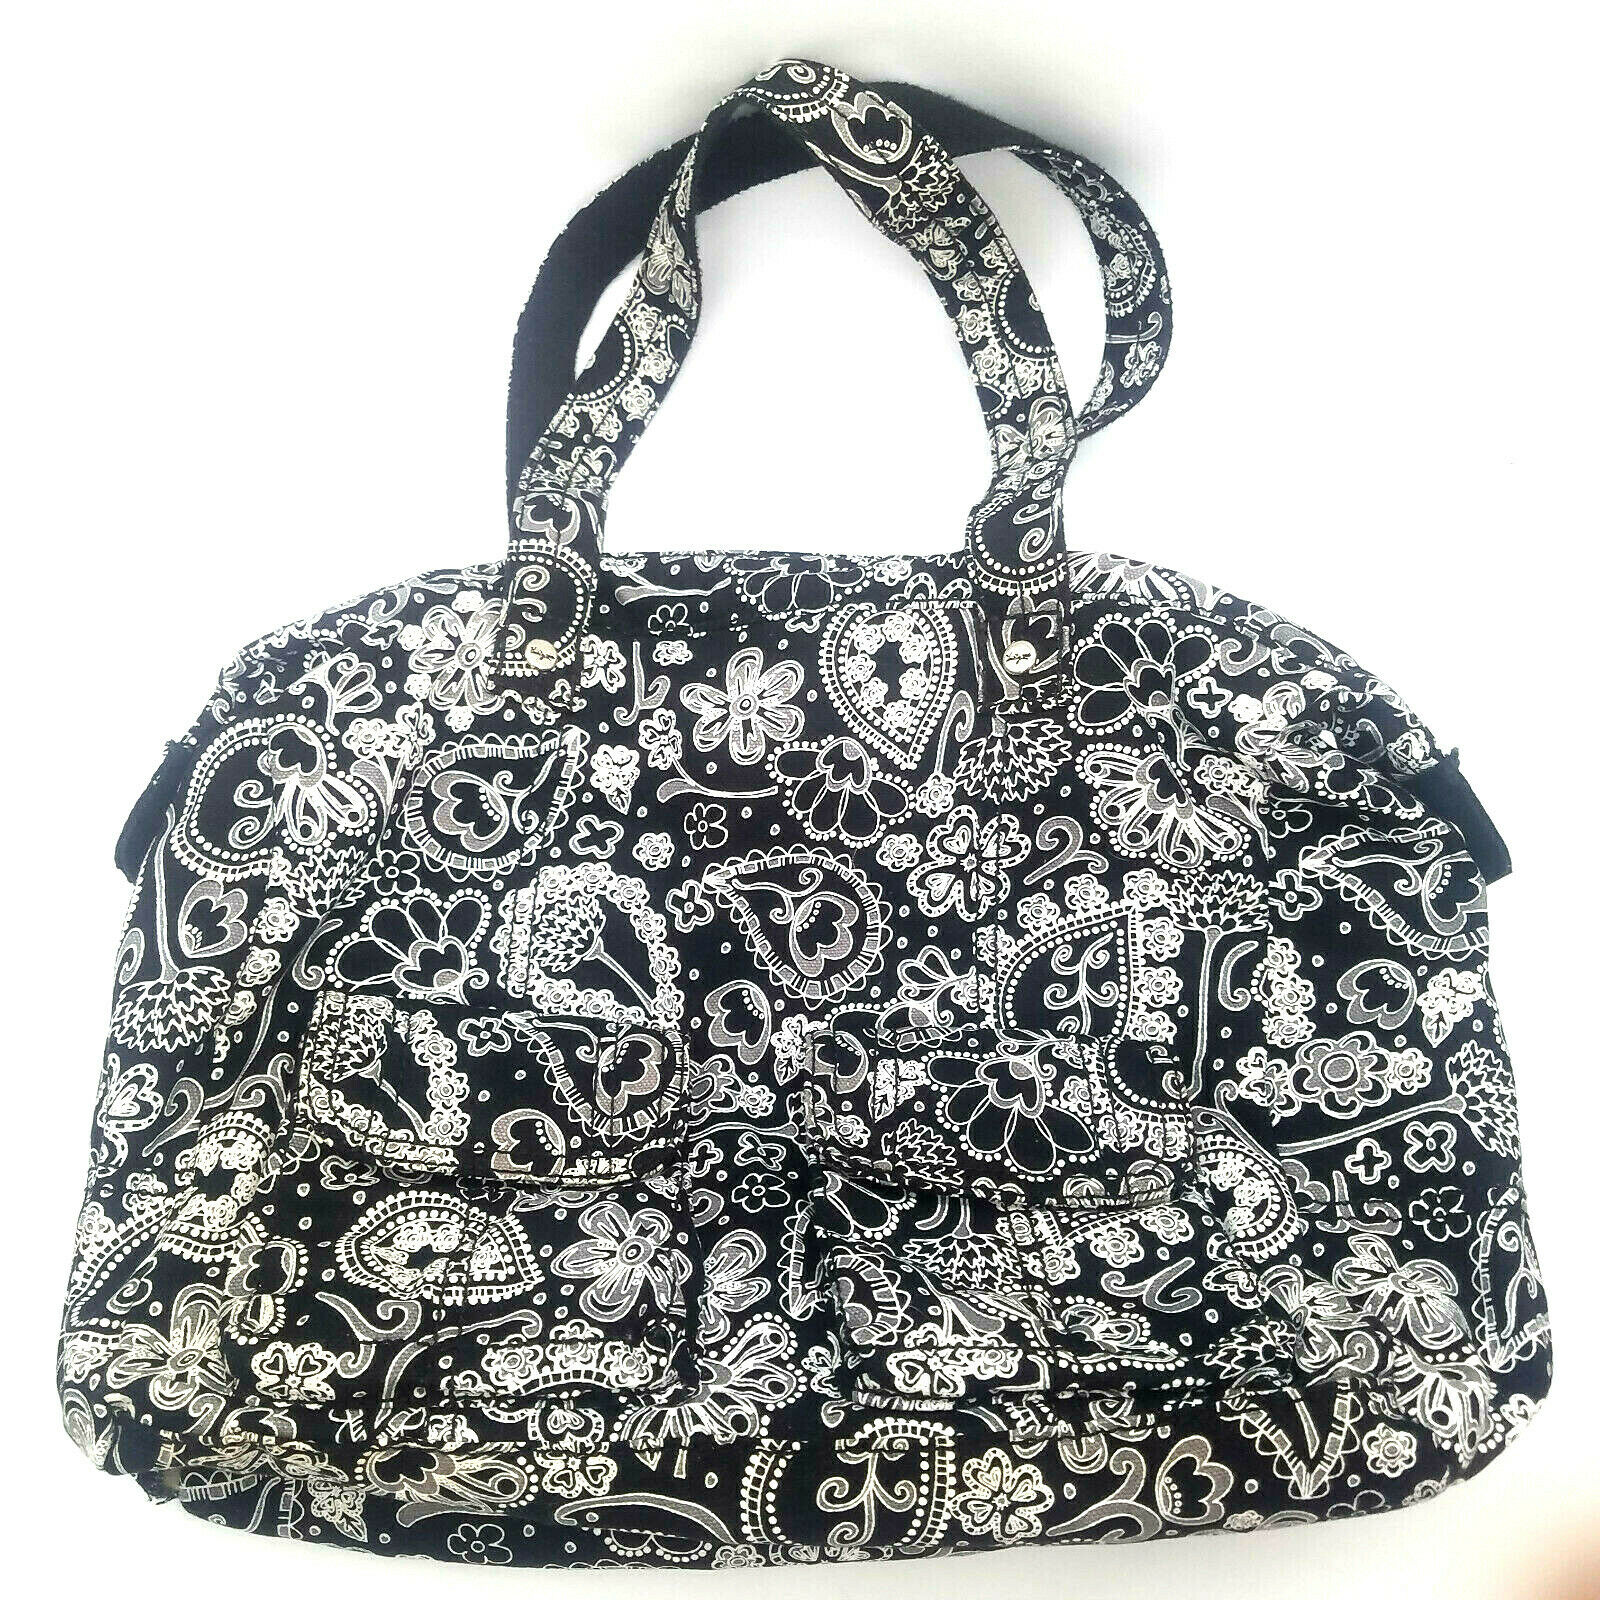 Thirty One Casual Cargo Purse Bag Black Paisley Parade Shoulder Overnight Diaper